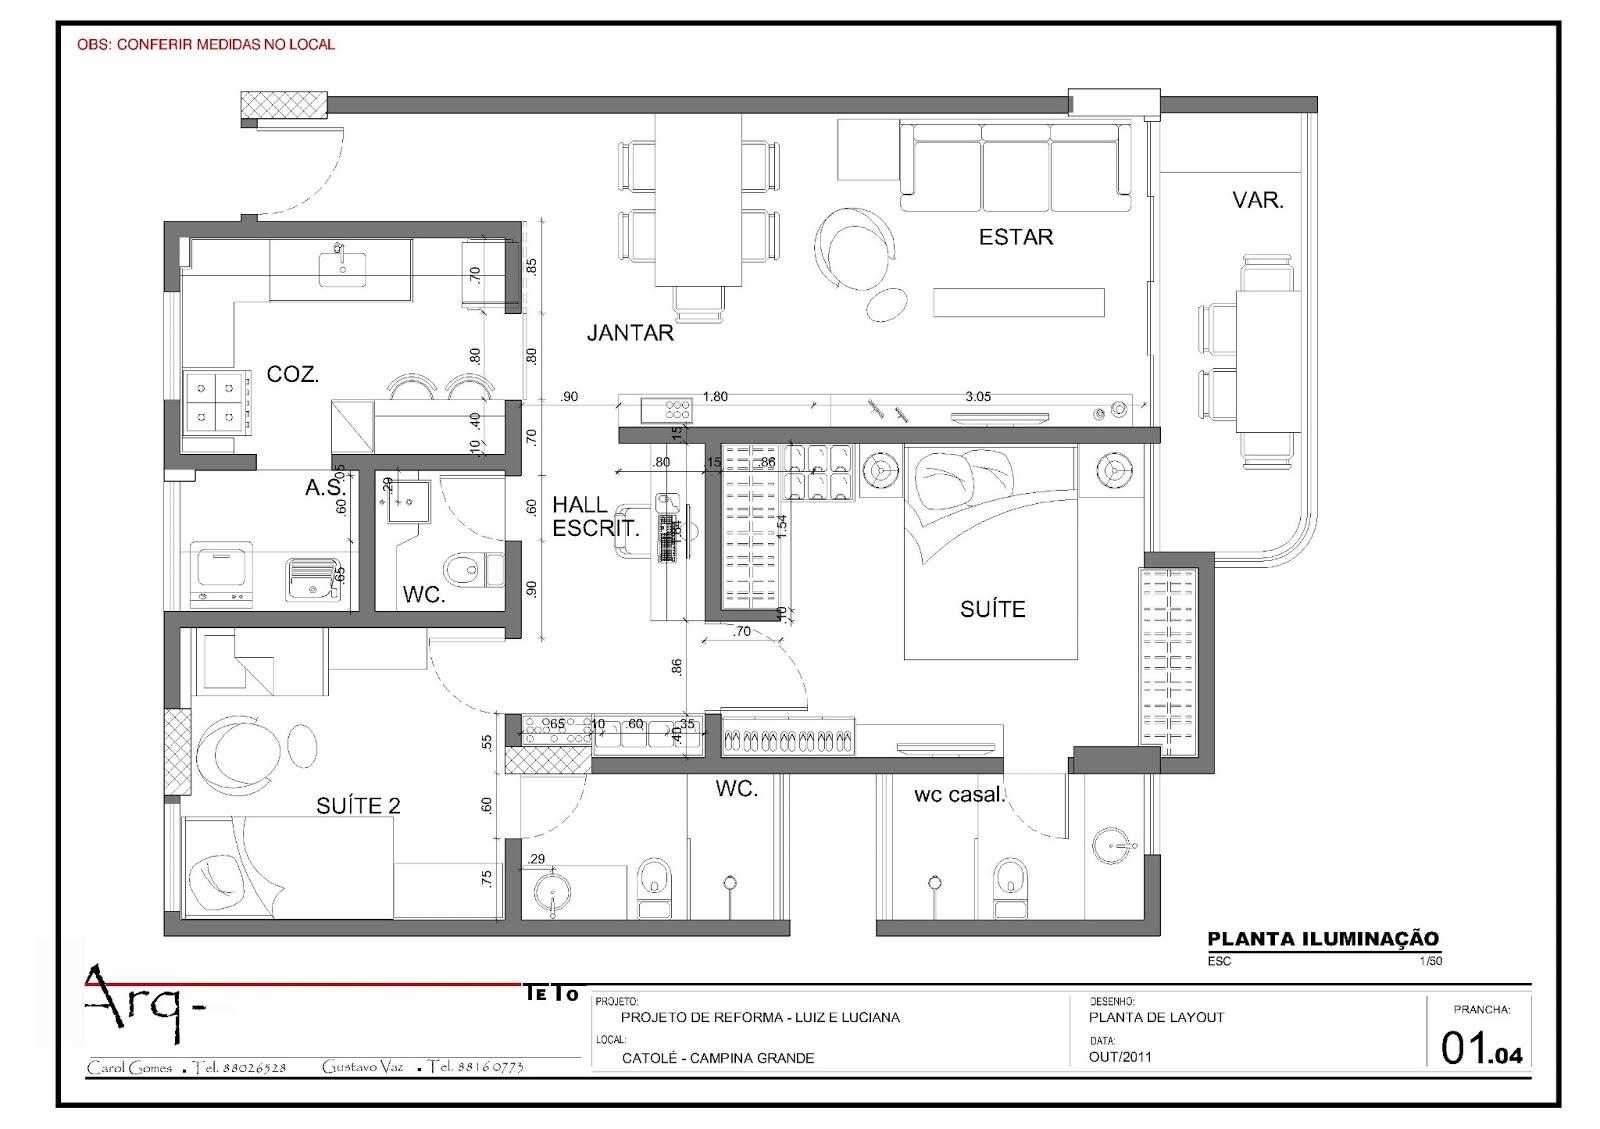 Two Bedroom Duplex For Rent Arq Teto